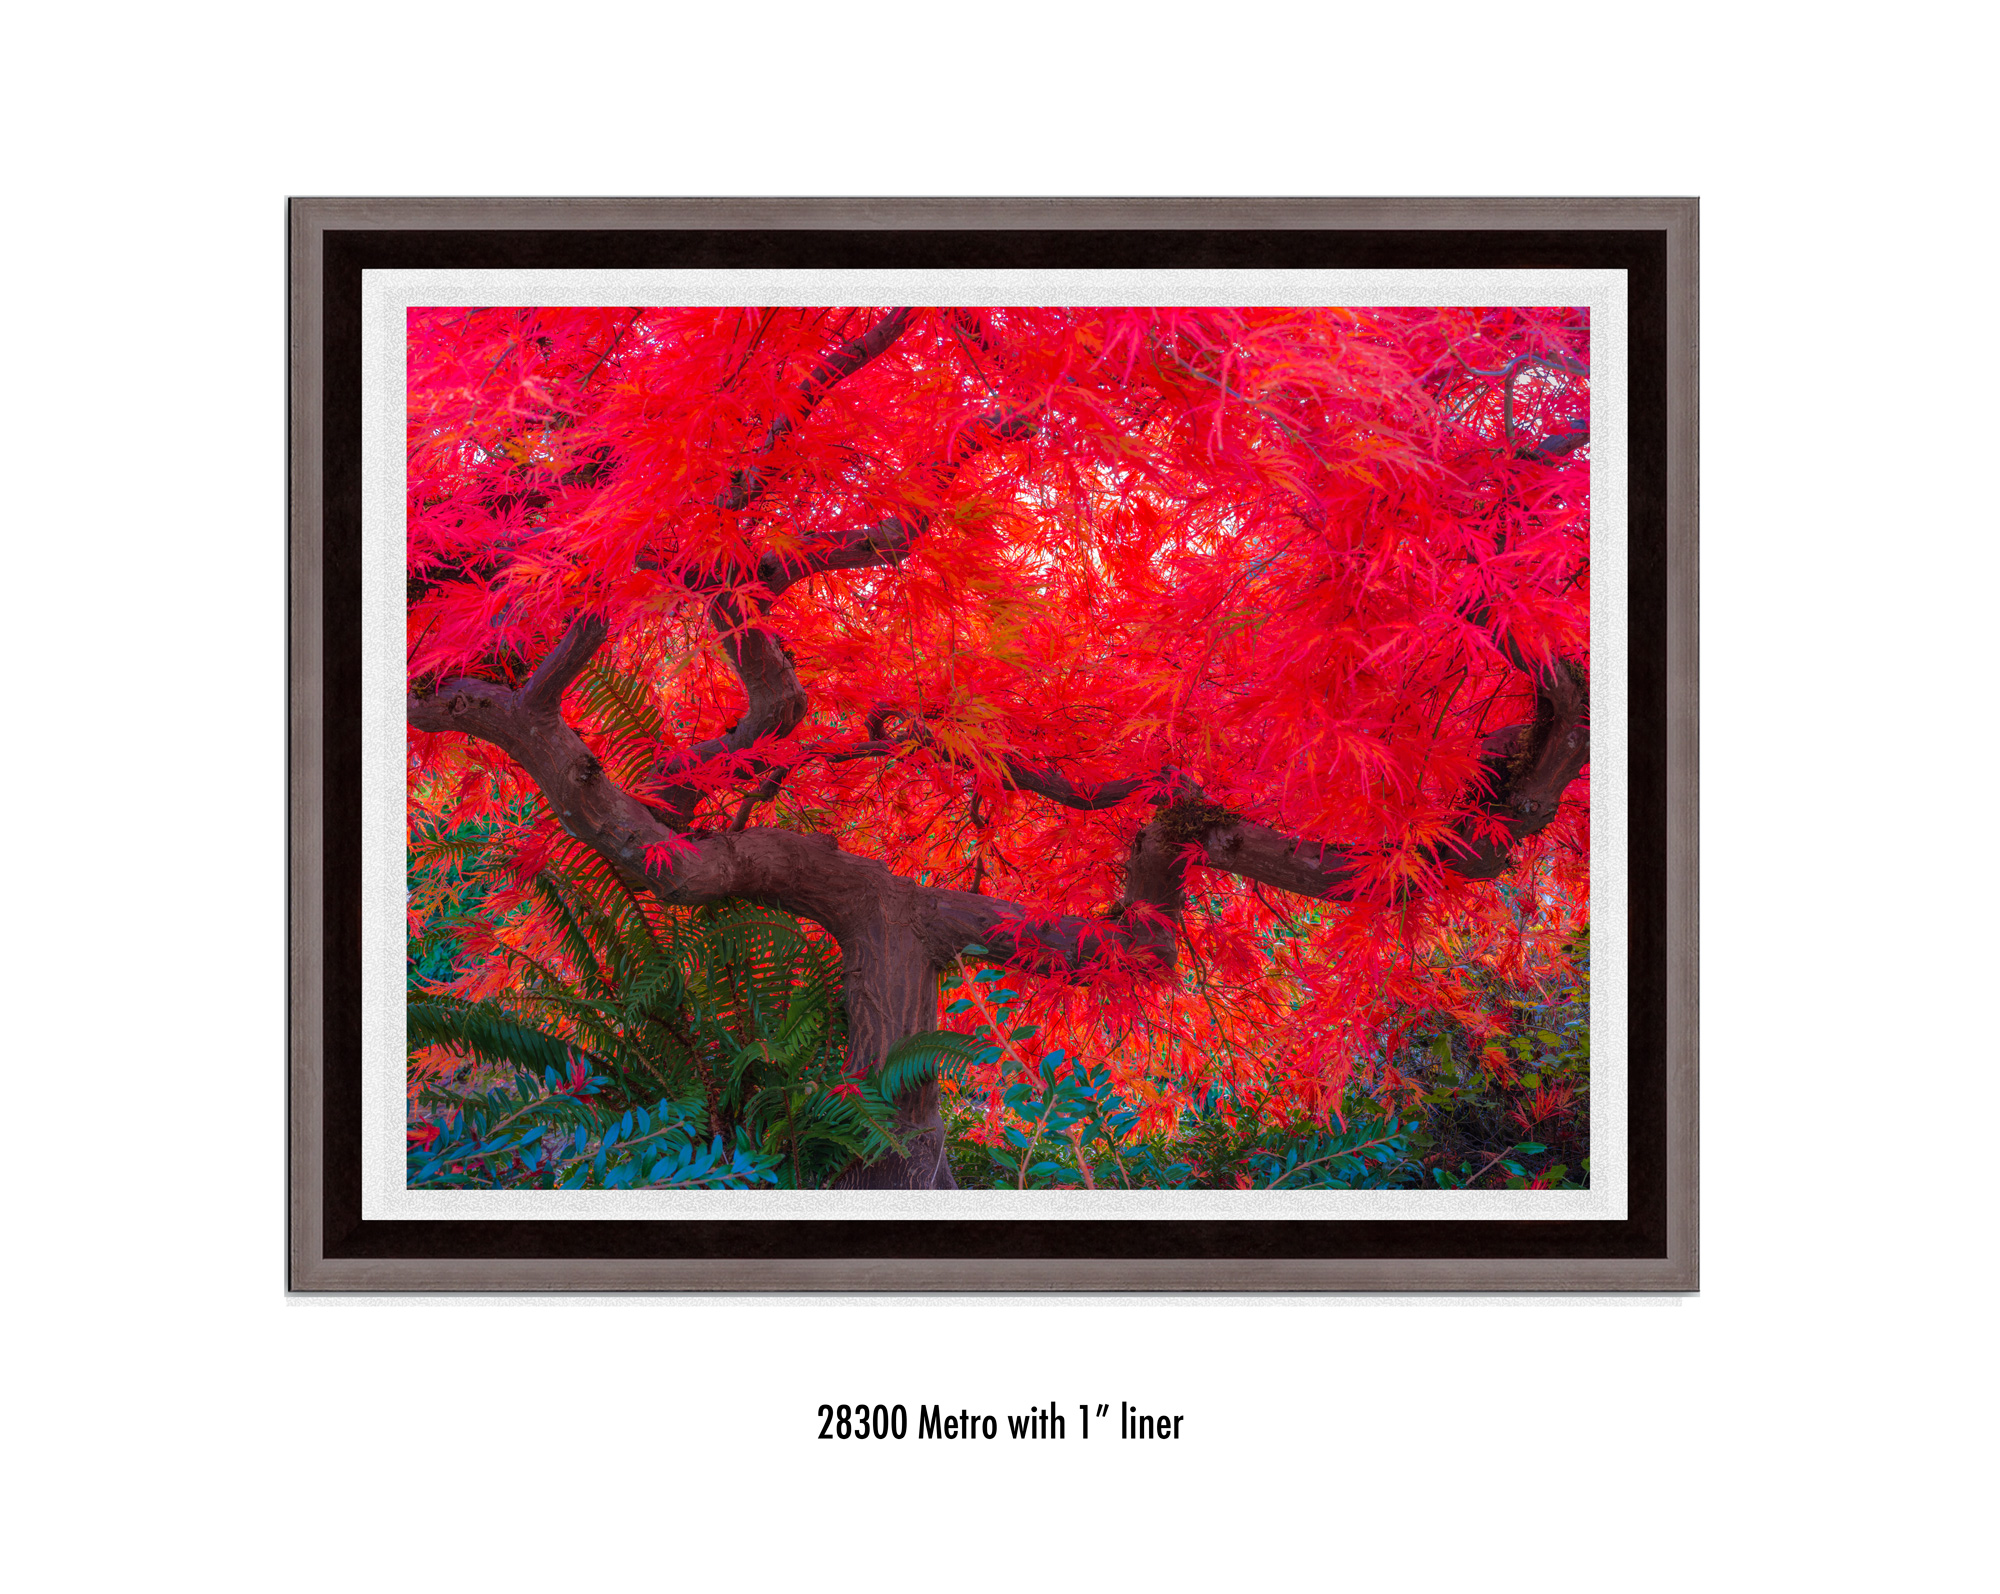 Scarlet-Tree-28300-1-wht.jpg